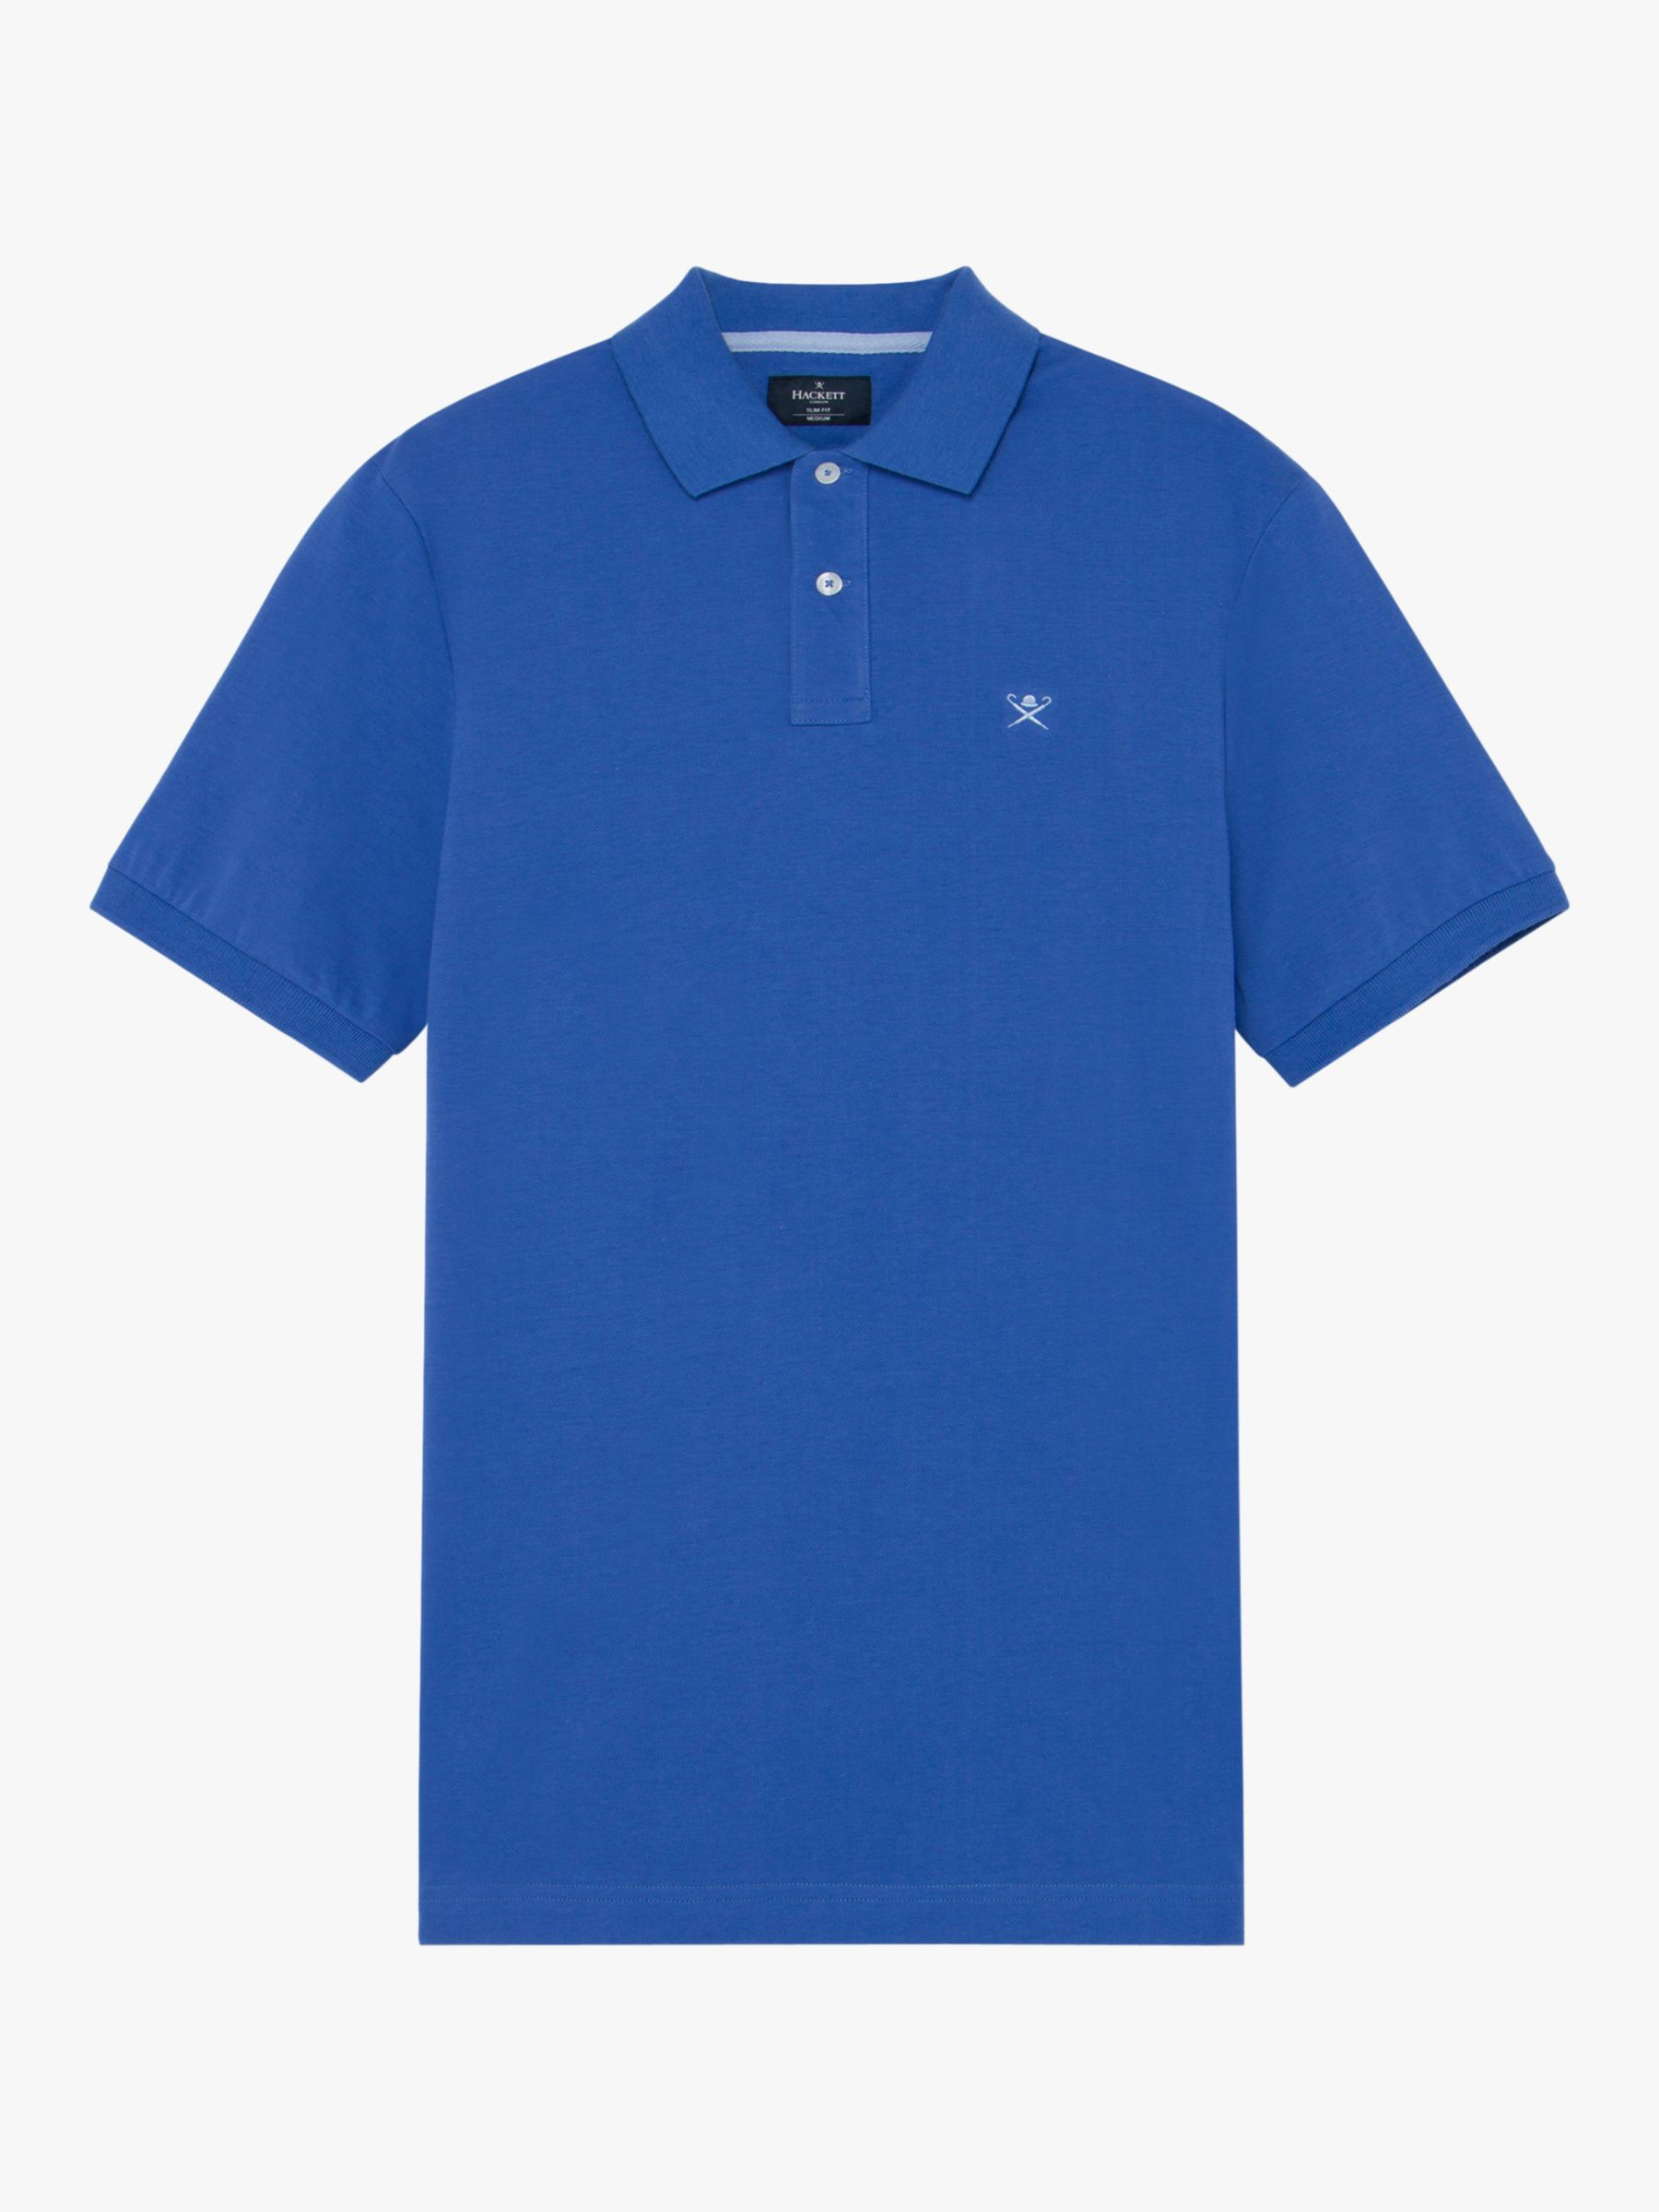 Hackett London Hackett London Short Sleeve Slim Fit Polo Shirt